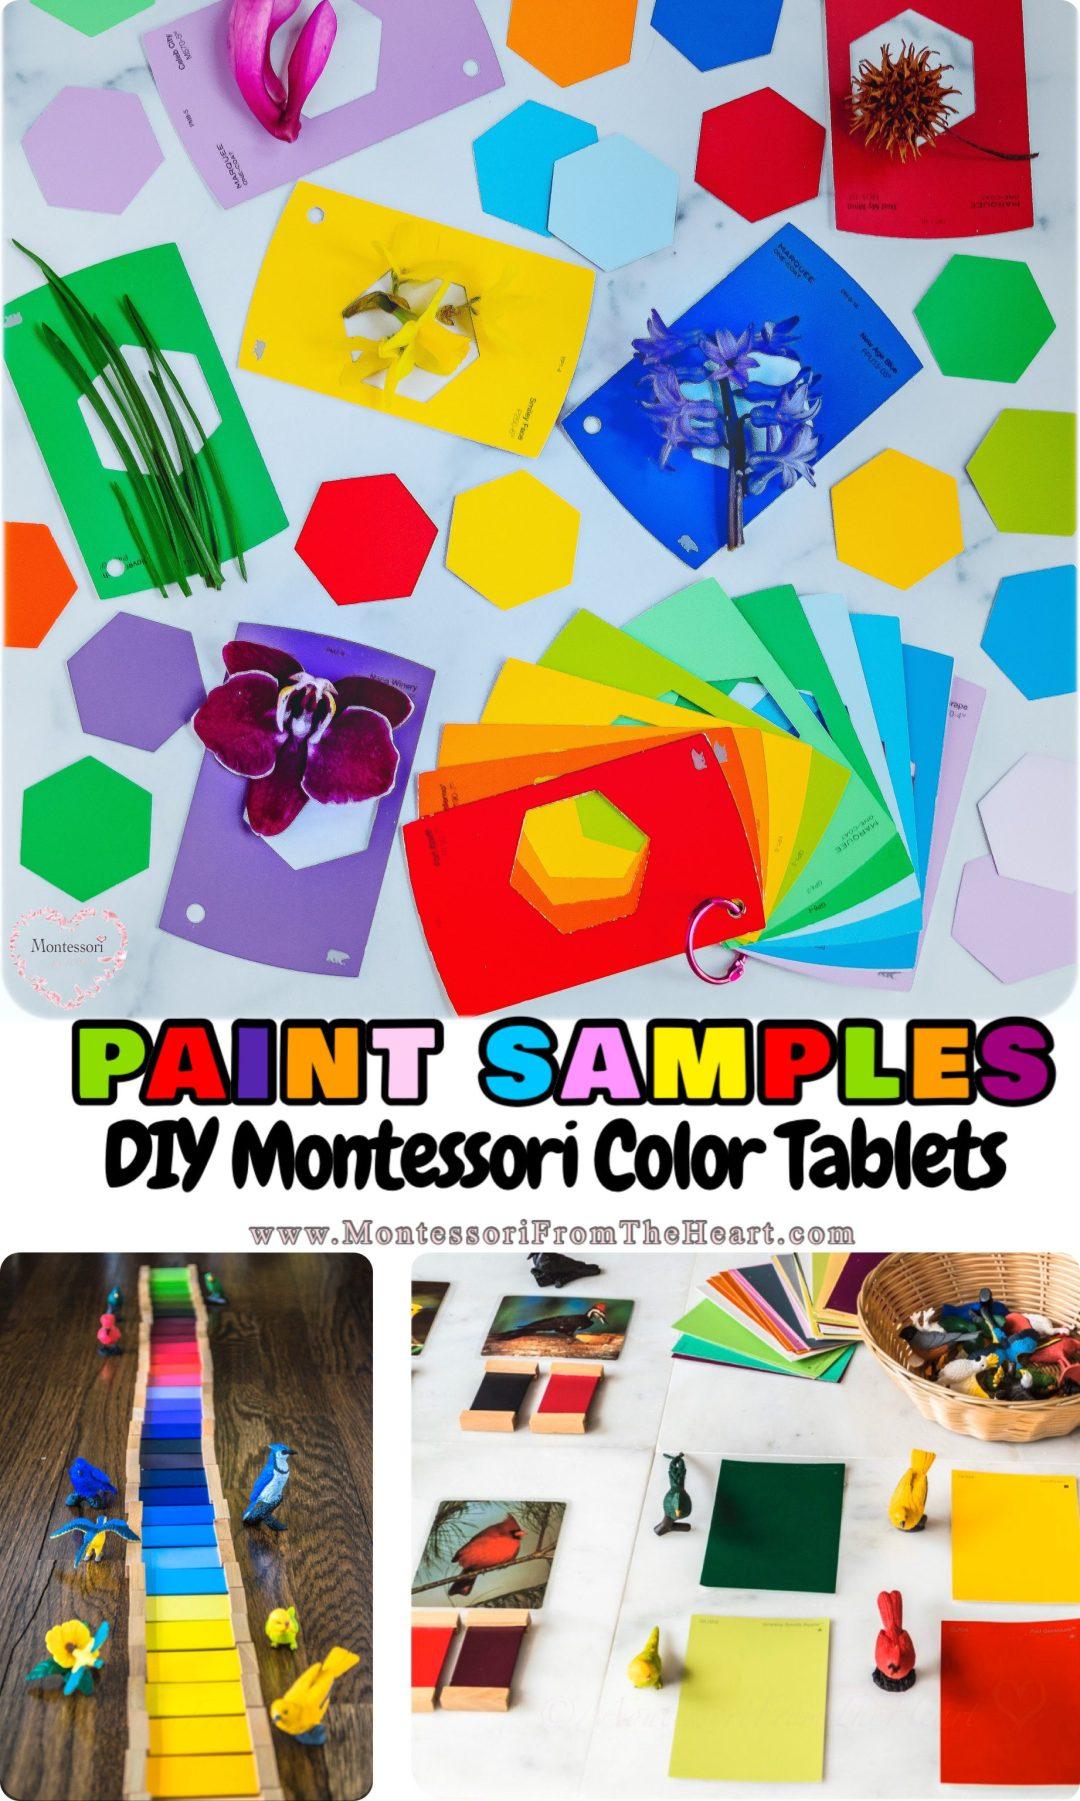 *DIY-Paint-Samples-Montessori-Color-Tablets-SafariLTD-Birds-Matching